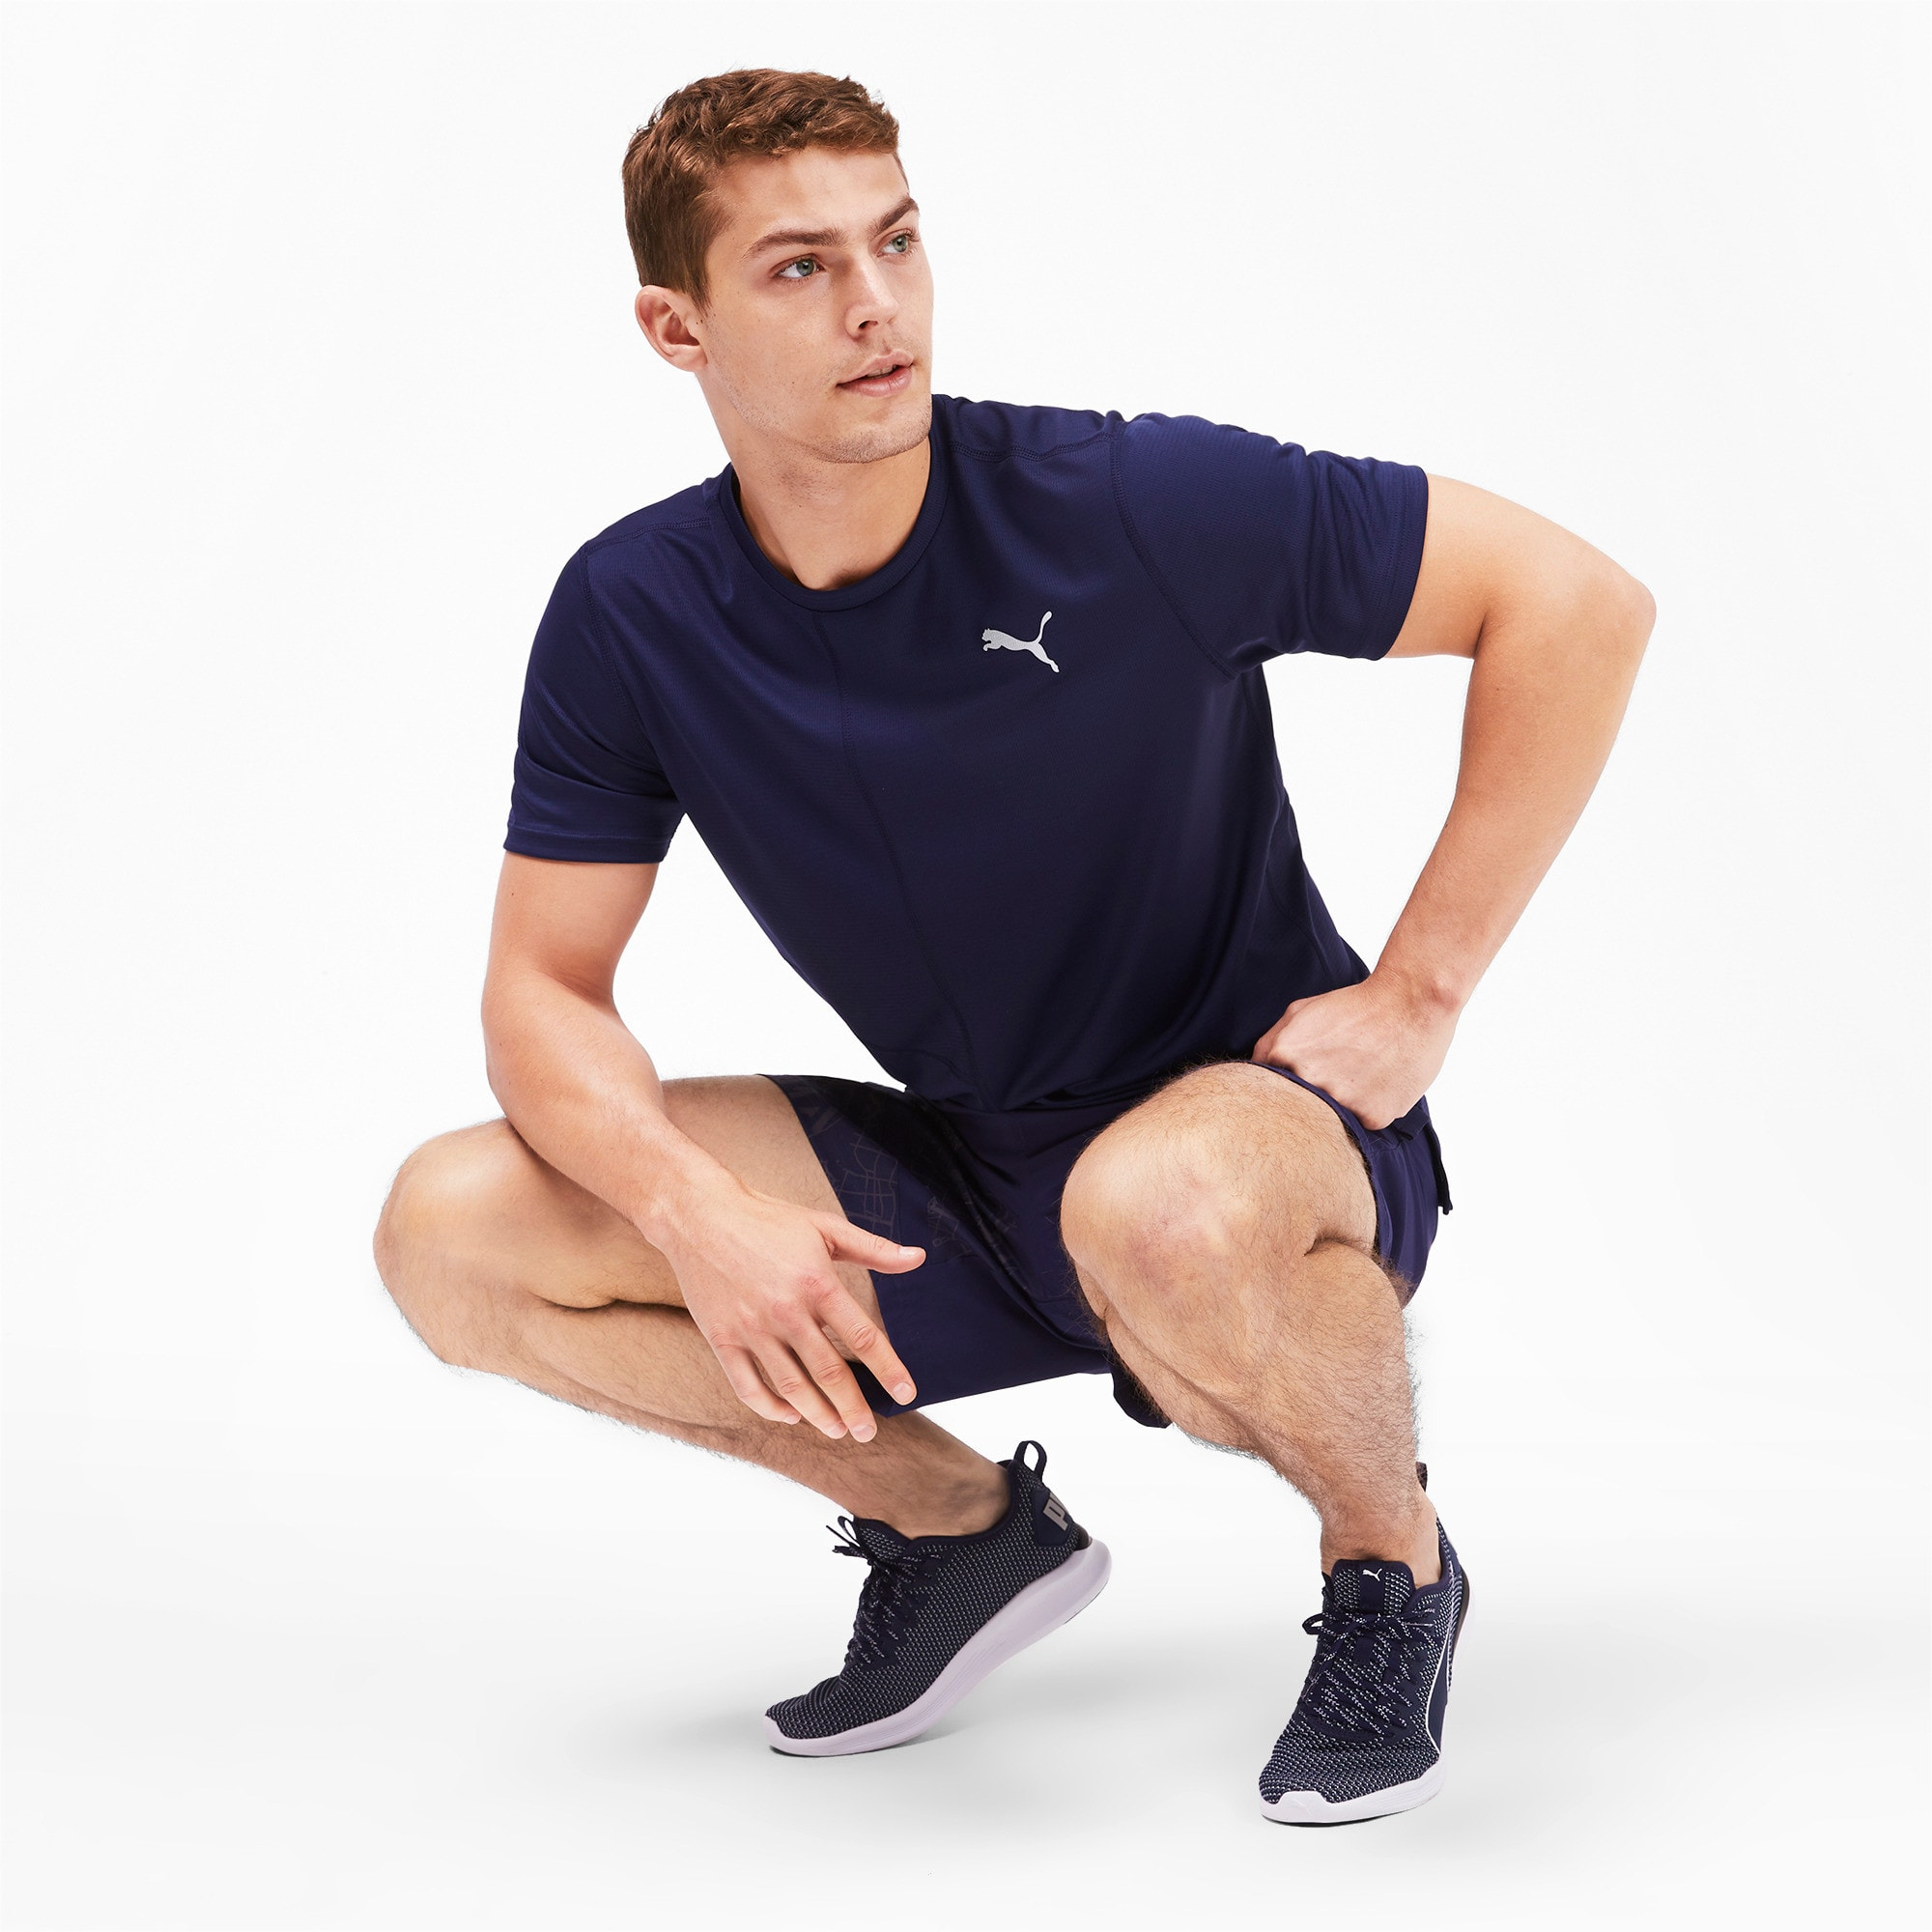 Thumbnail 3 of IGNITE Men's Running T-Shirt, Peacoat, medium